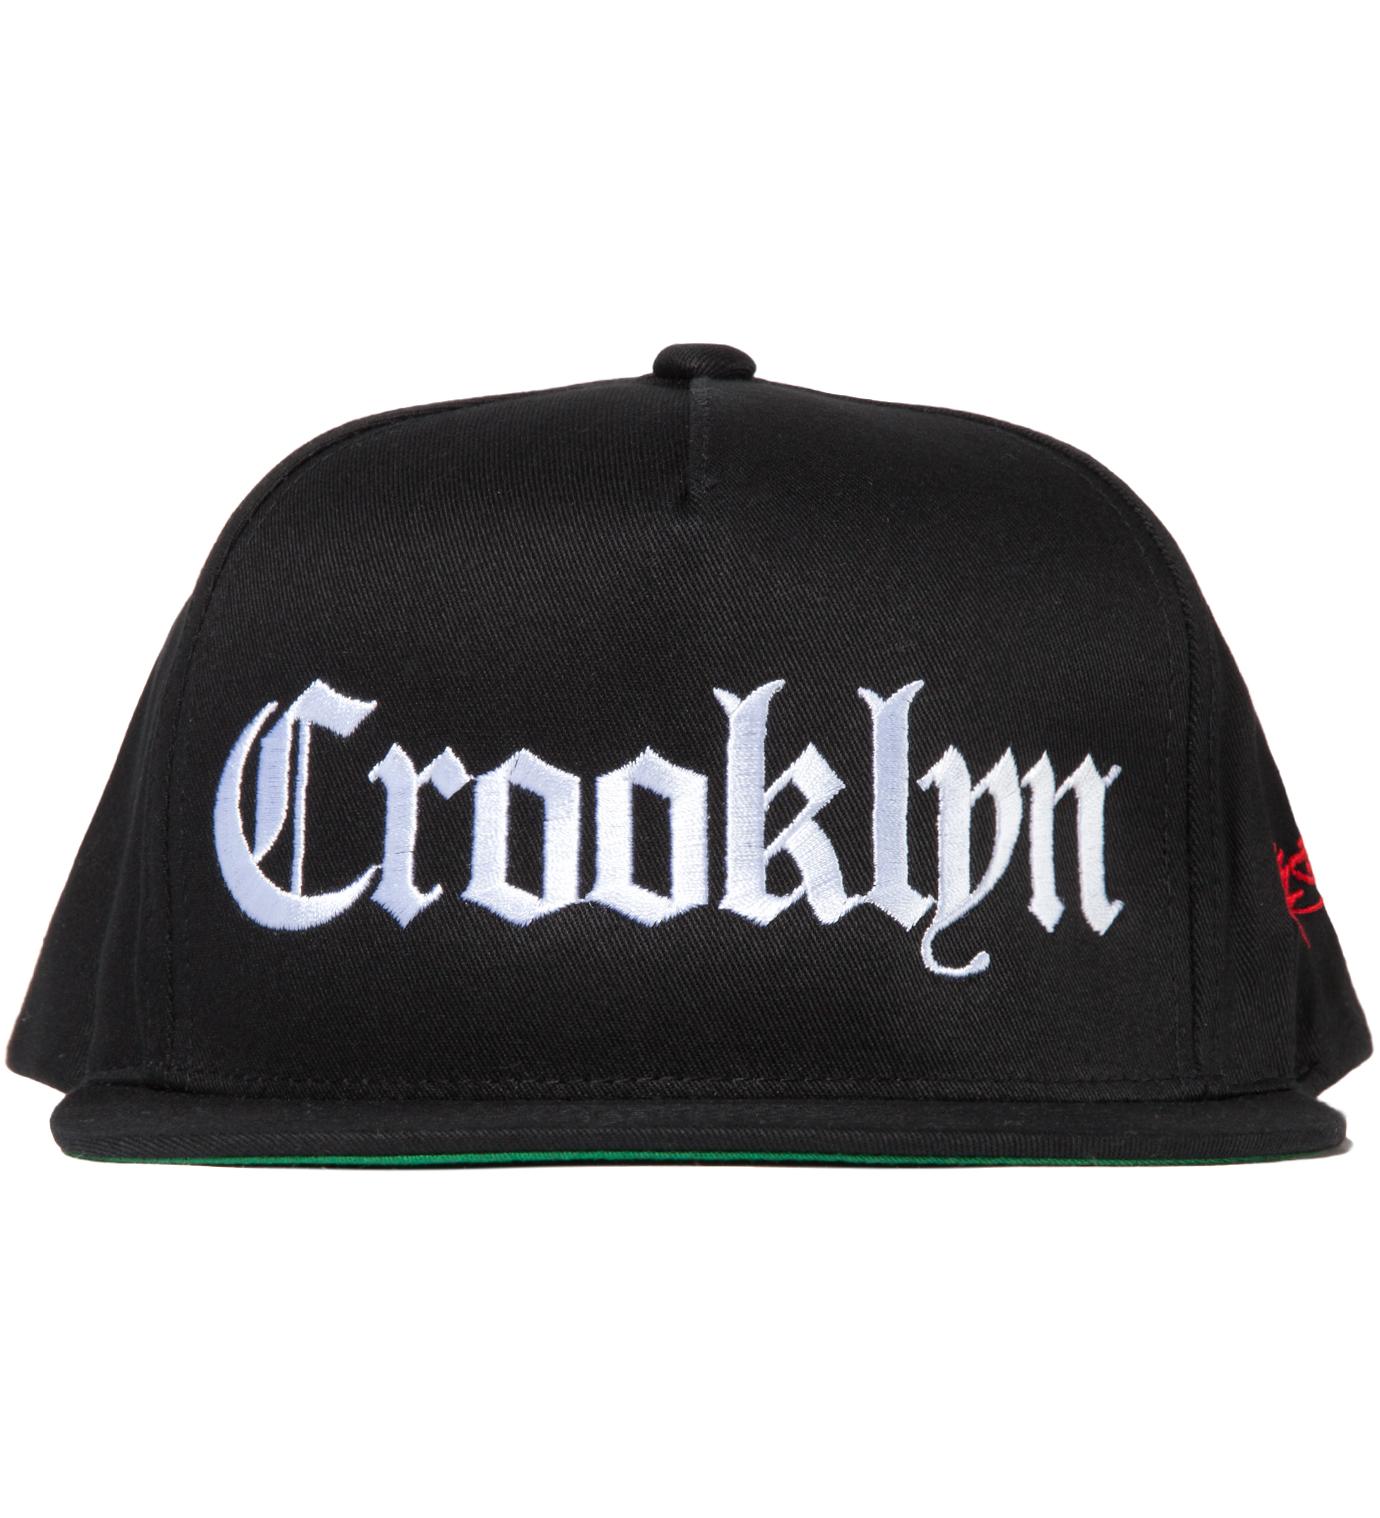 SSUR Black Crooklyn Snapback Hat